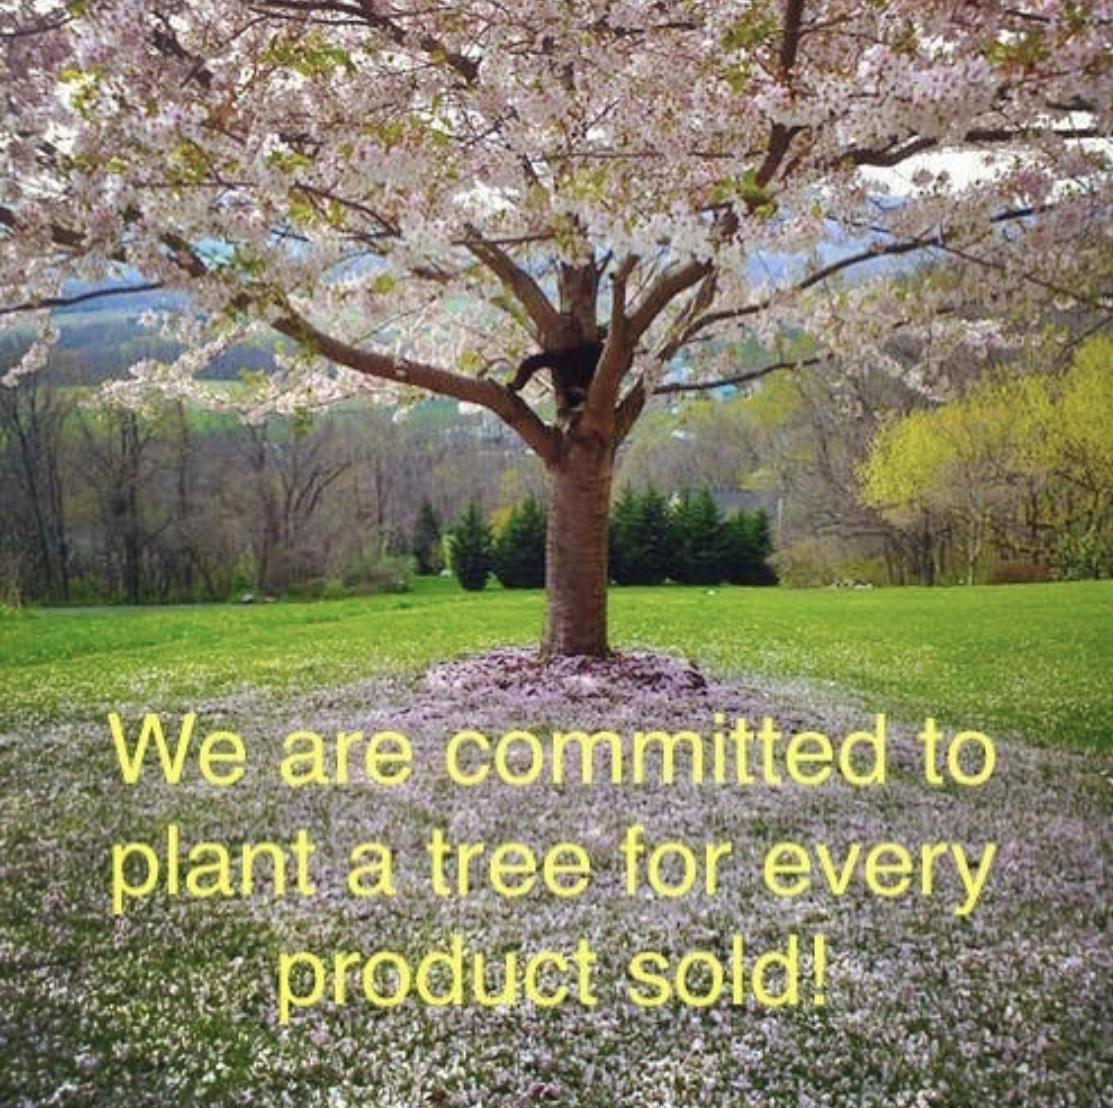 dr.-lily-ros-organics-plants-a-tree-beauty-eco-beauty